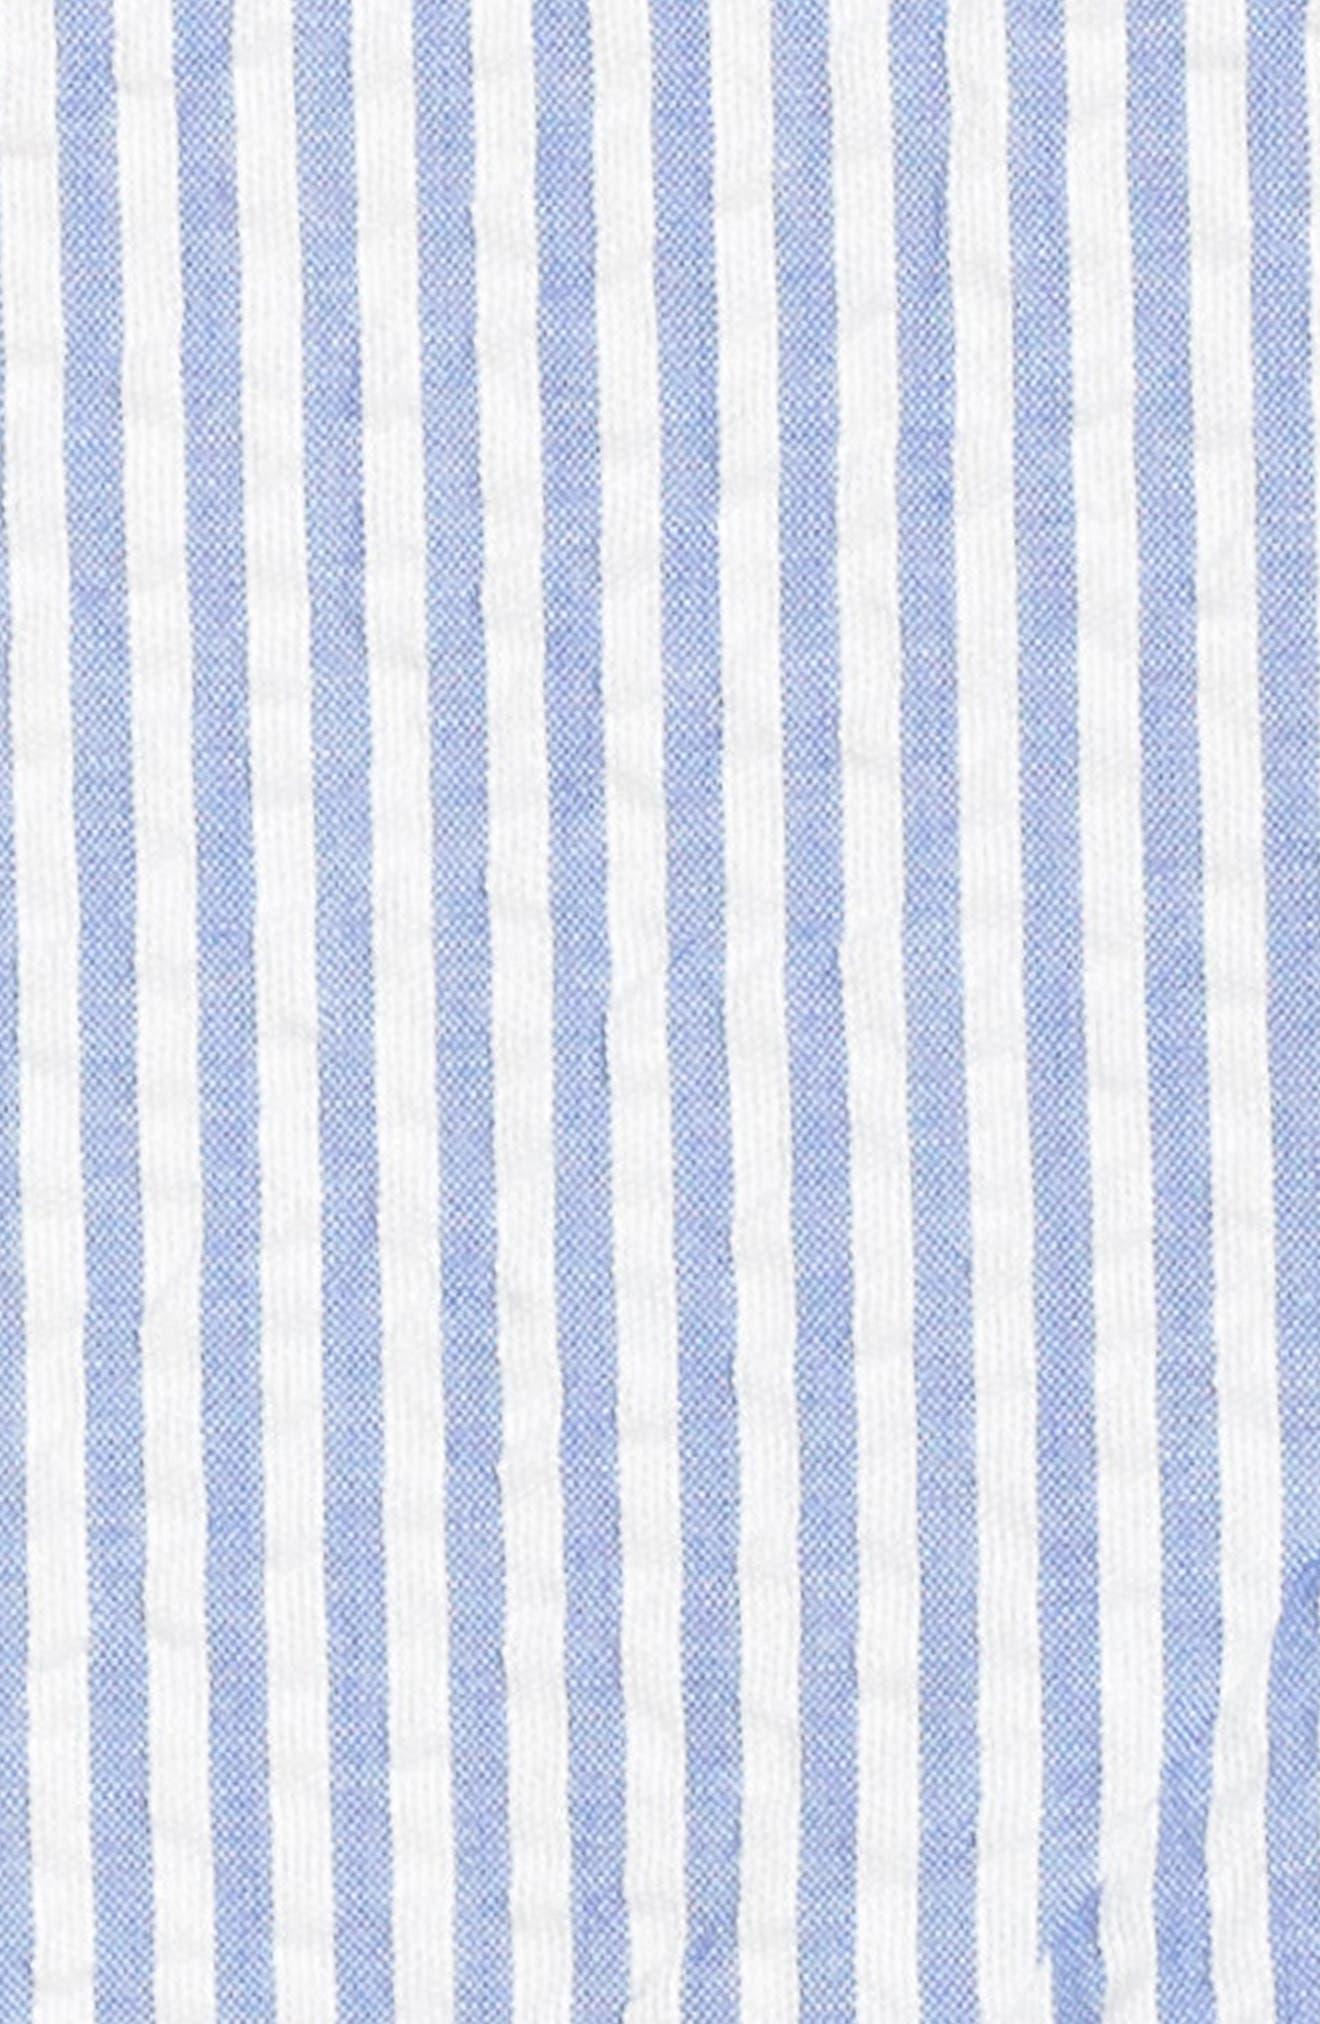 J.Crew Spaghetti Strap Ruffle Dress,                             Alternate thumbnail 5, color,                             Blue White